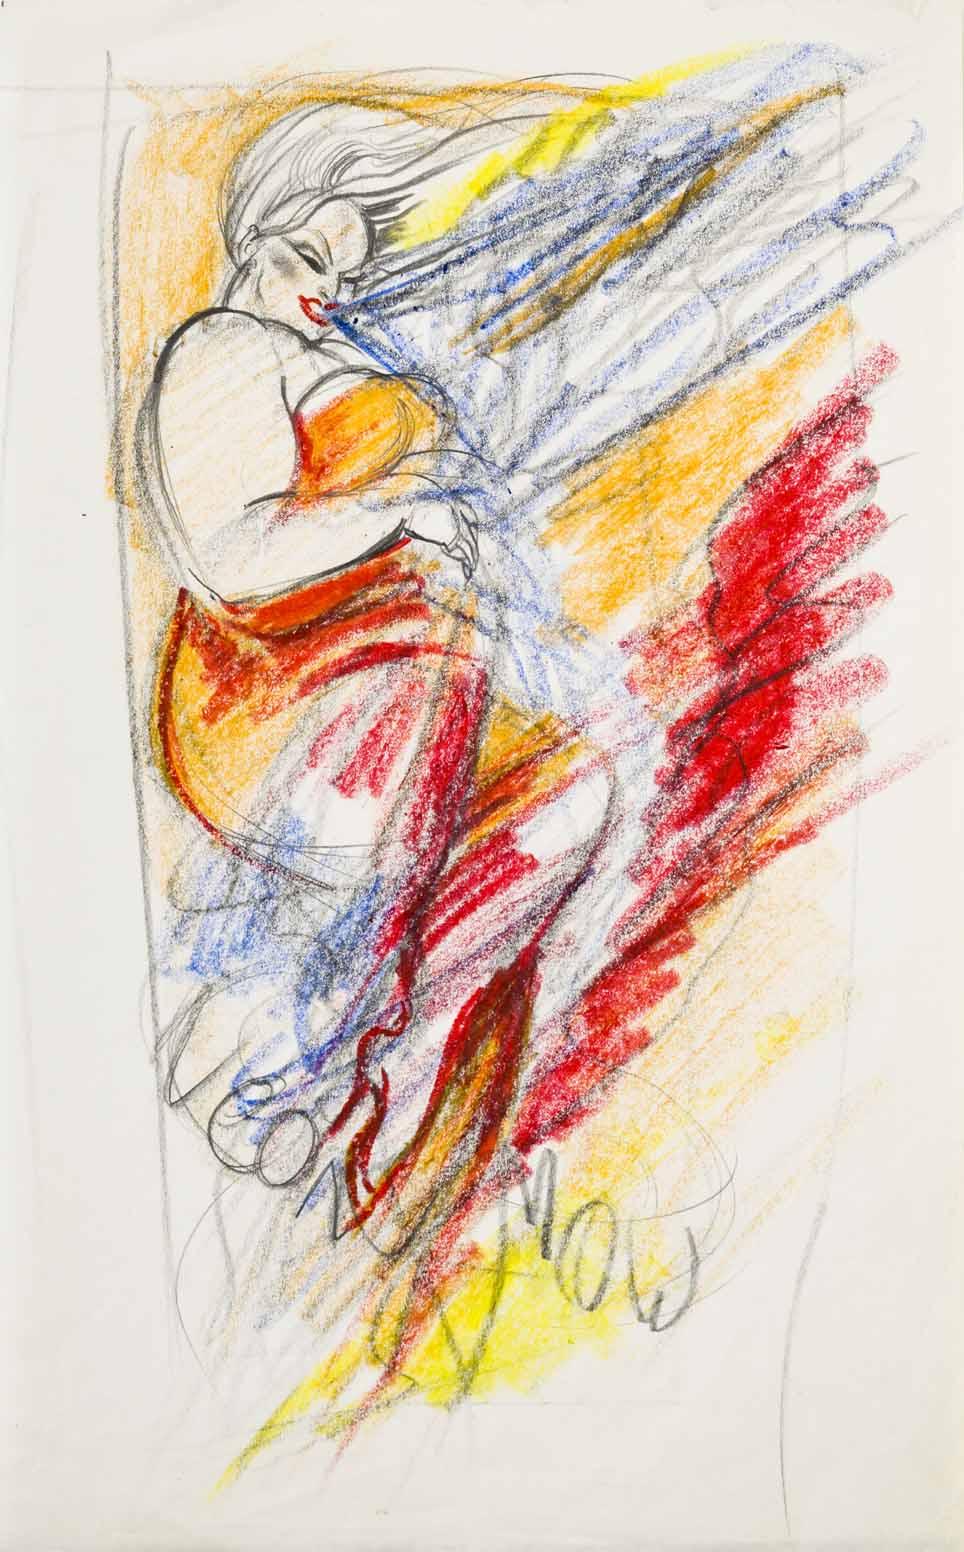 AL154_Divine,NeonWomanplay_1976_Crayonandpencilonpaper_16.88x10